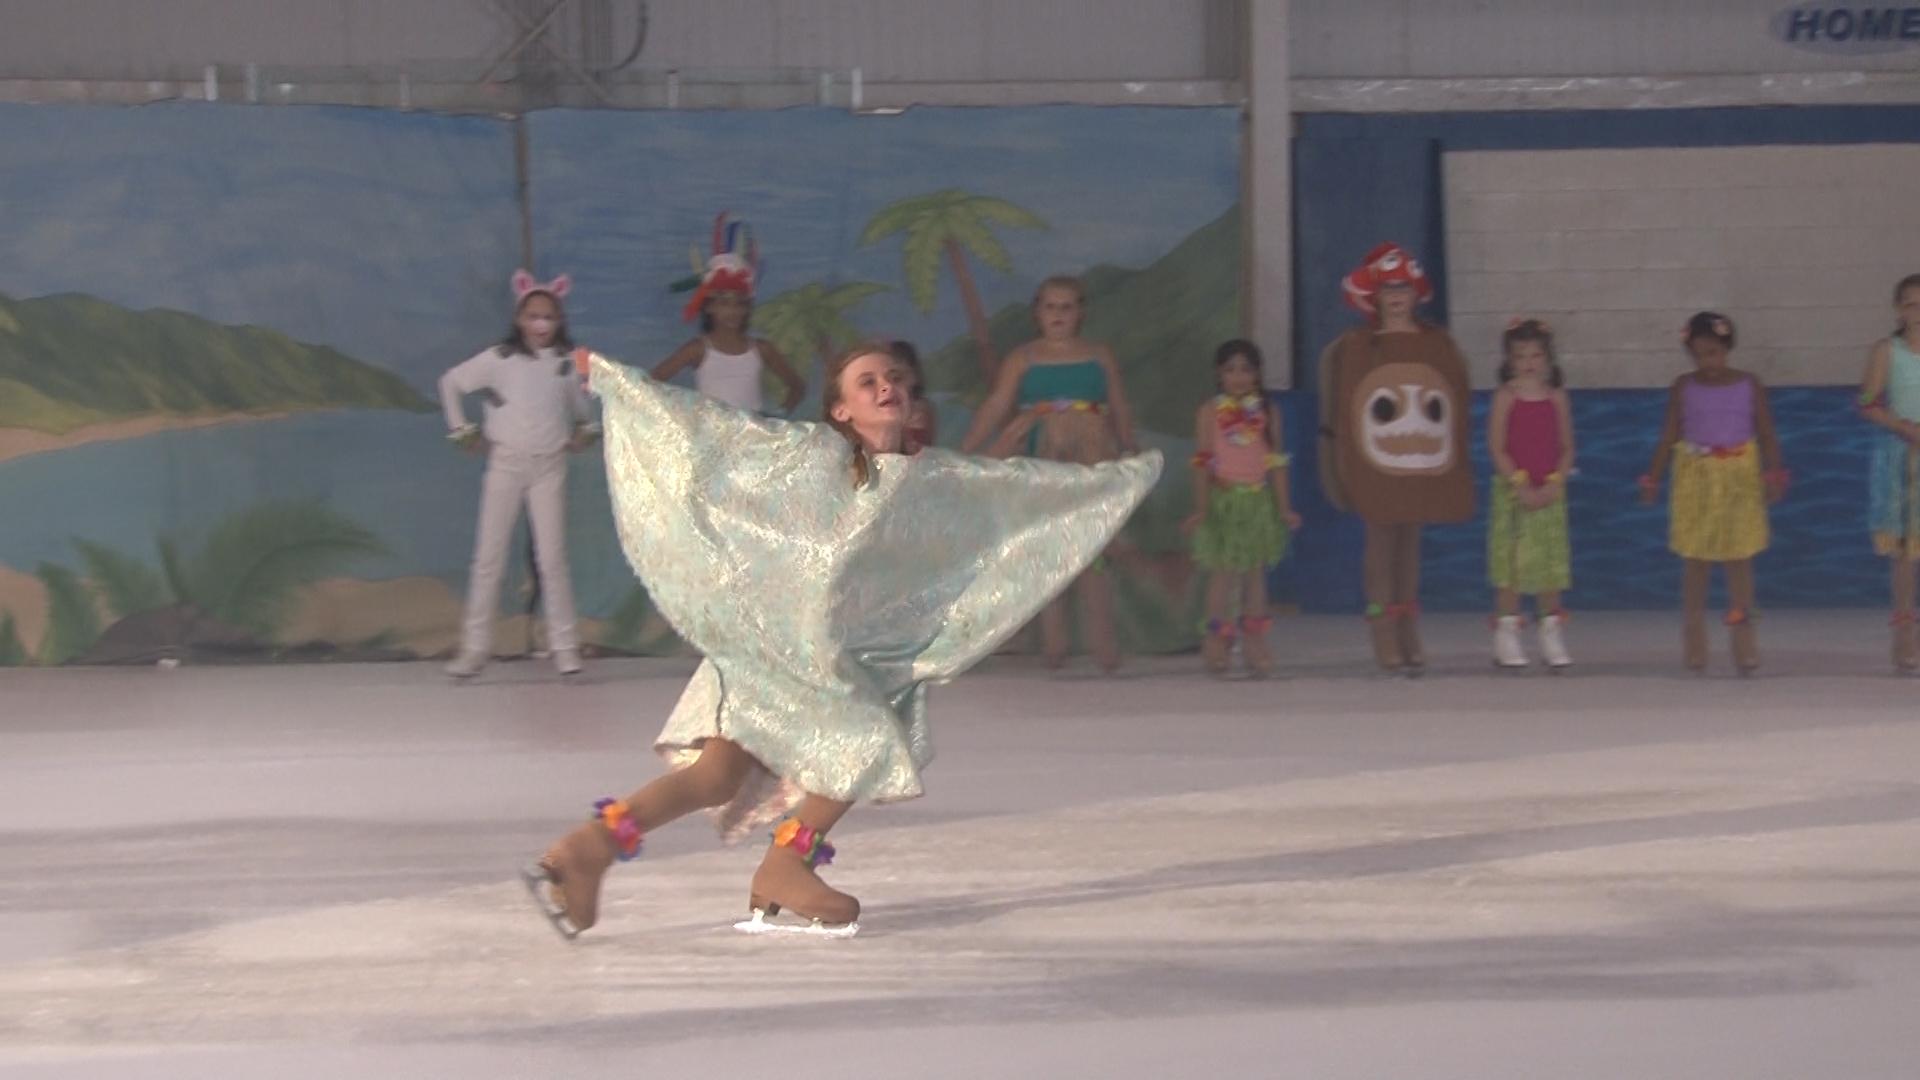 Power Play Maui Skate on Ice 071417.01_00_01_03.Still097.jpg